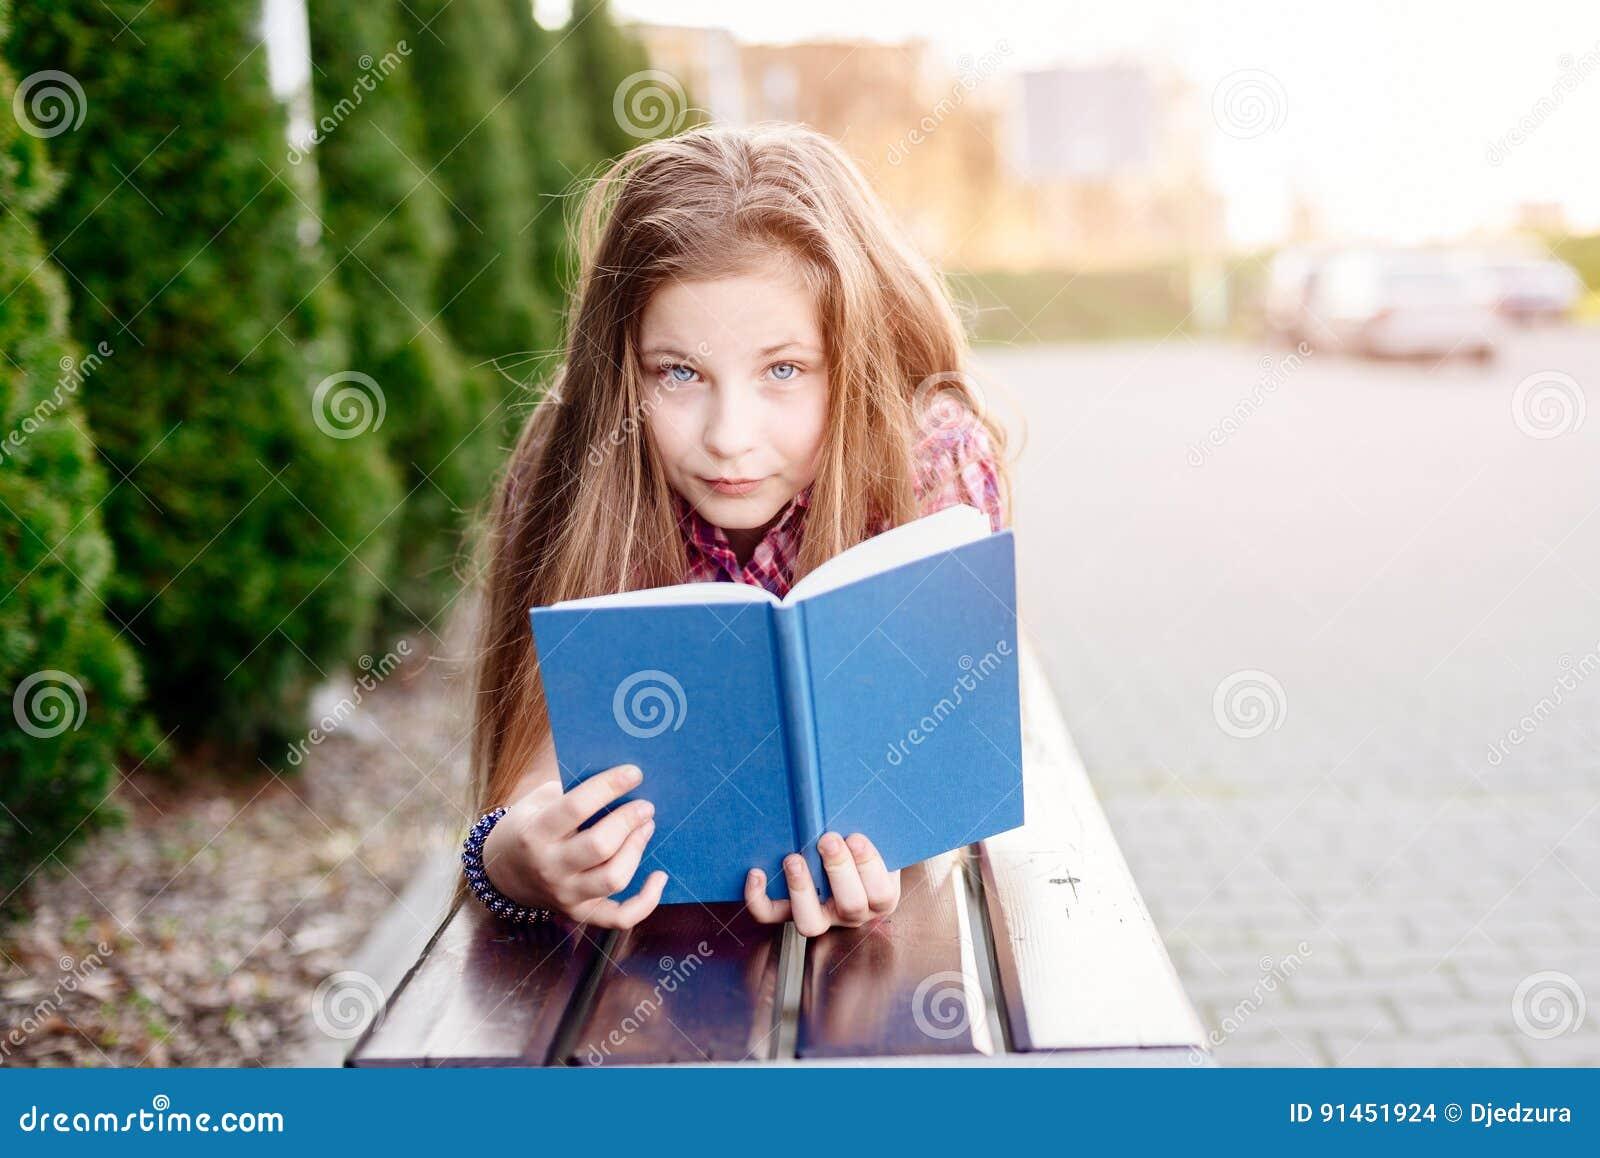 57b30feaded Χρονών ξανθό βιβλίο ανάγνωσης κοριτσιών μπλε ματιών τα δέκα στον πάγκο.  Περισσότερες παρόμοιες στοκ εικόνες